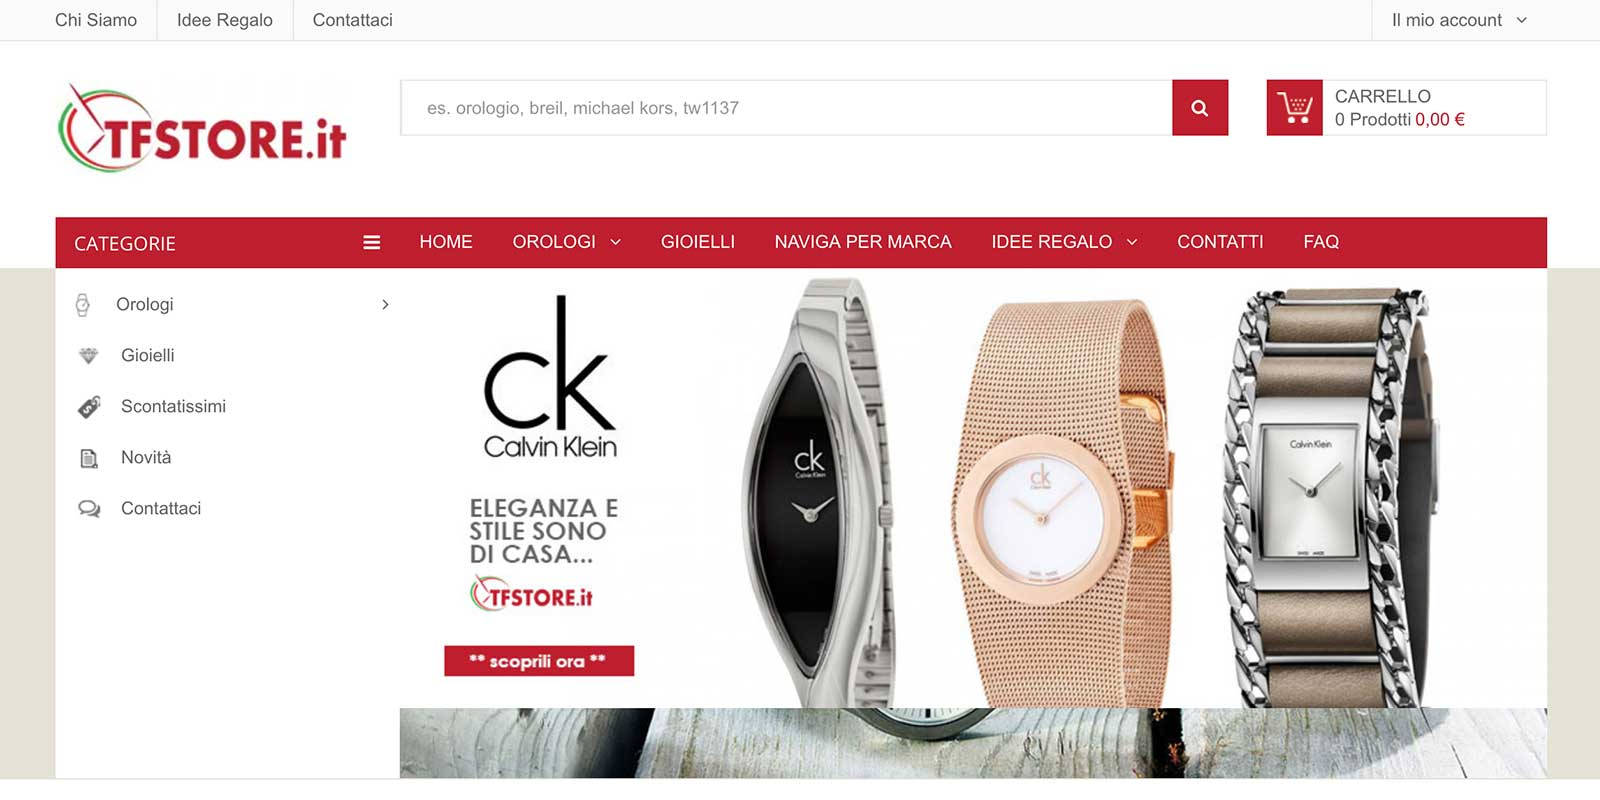 nandida.com orologi